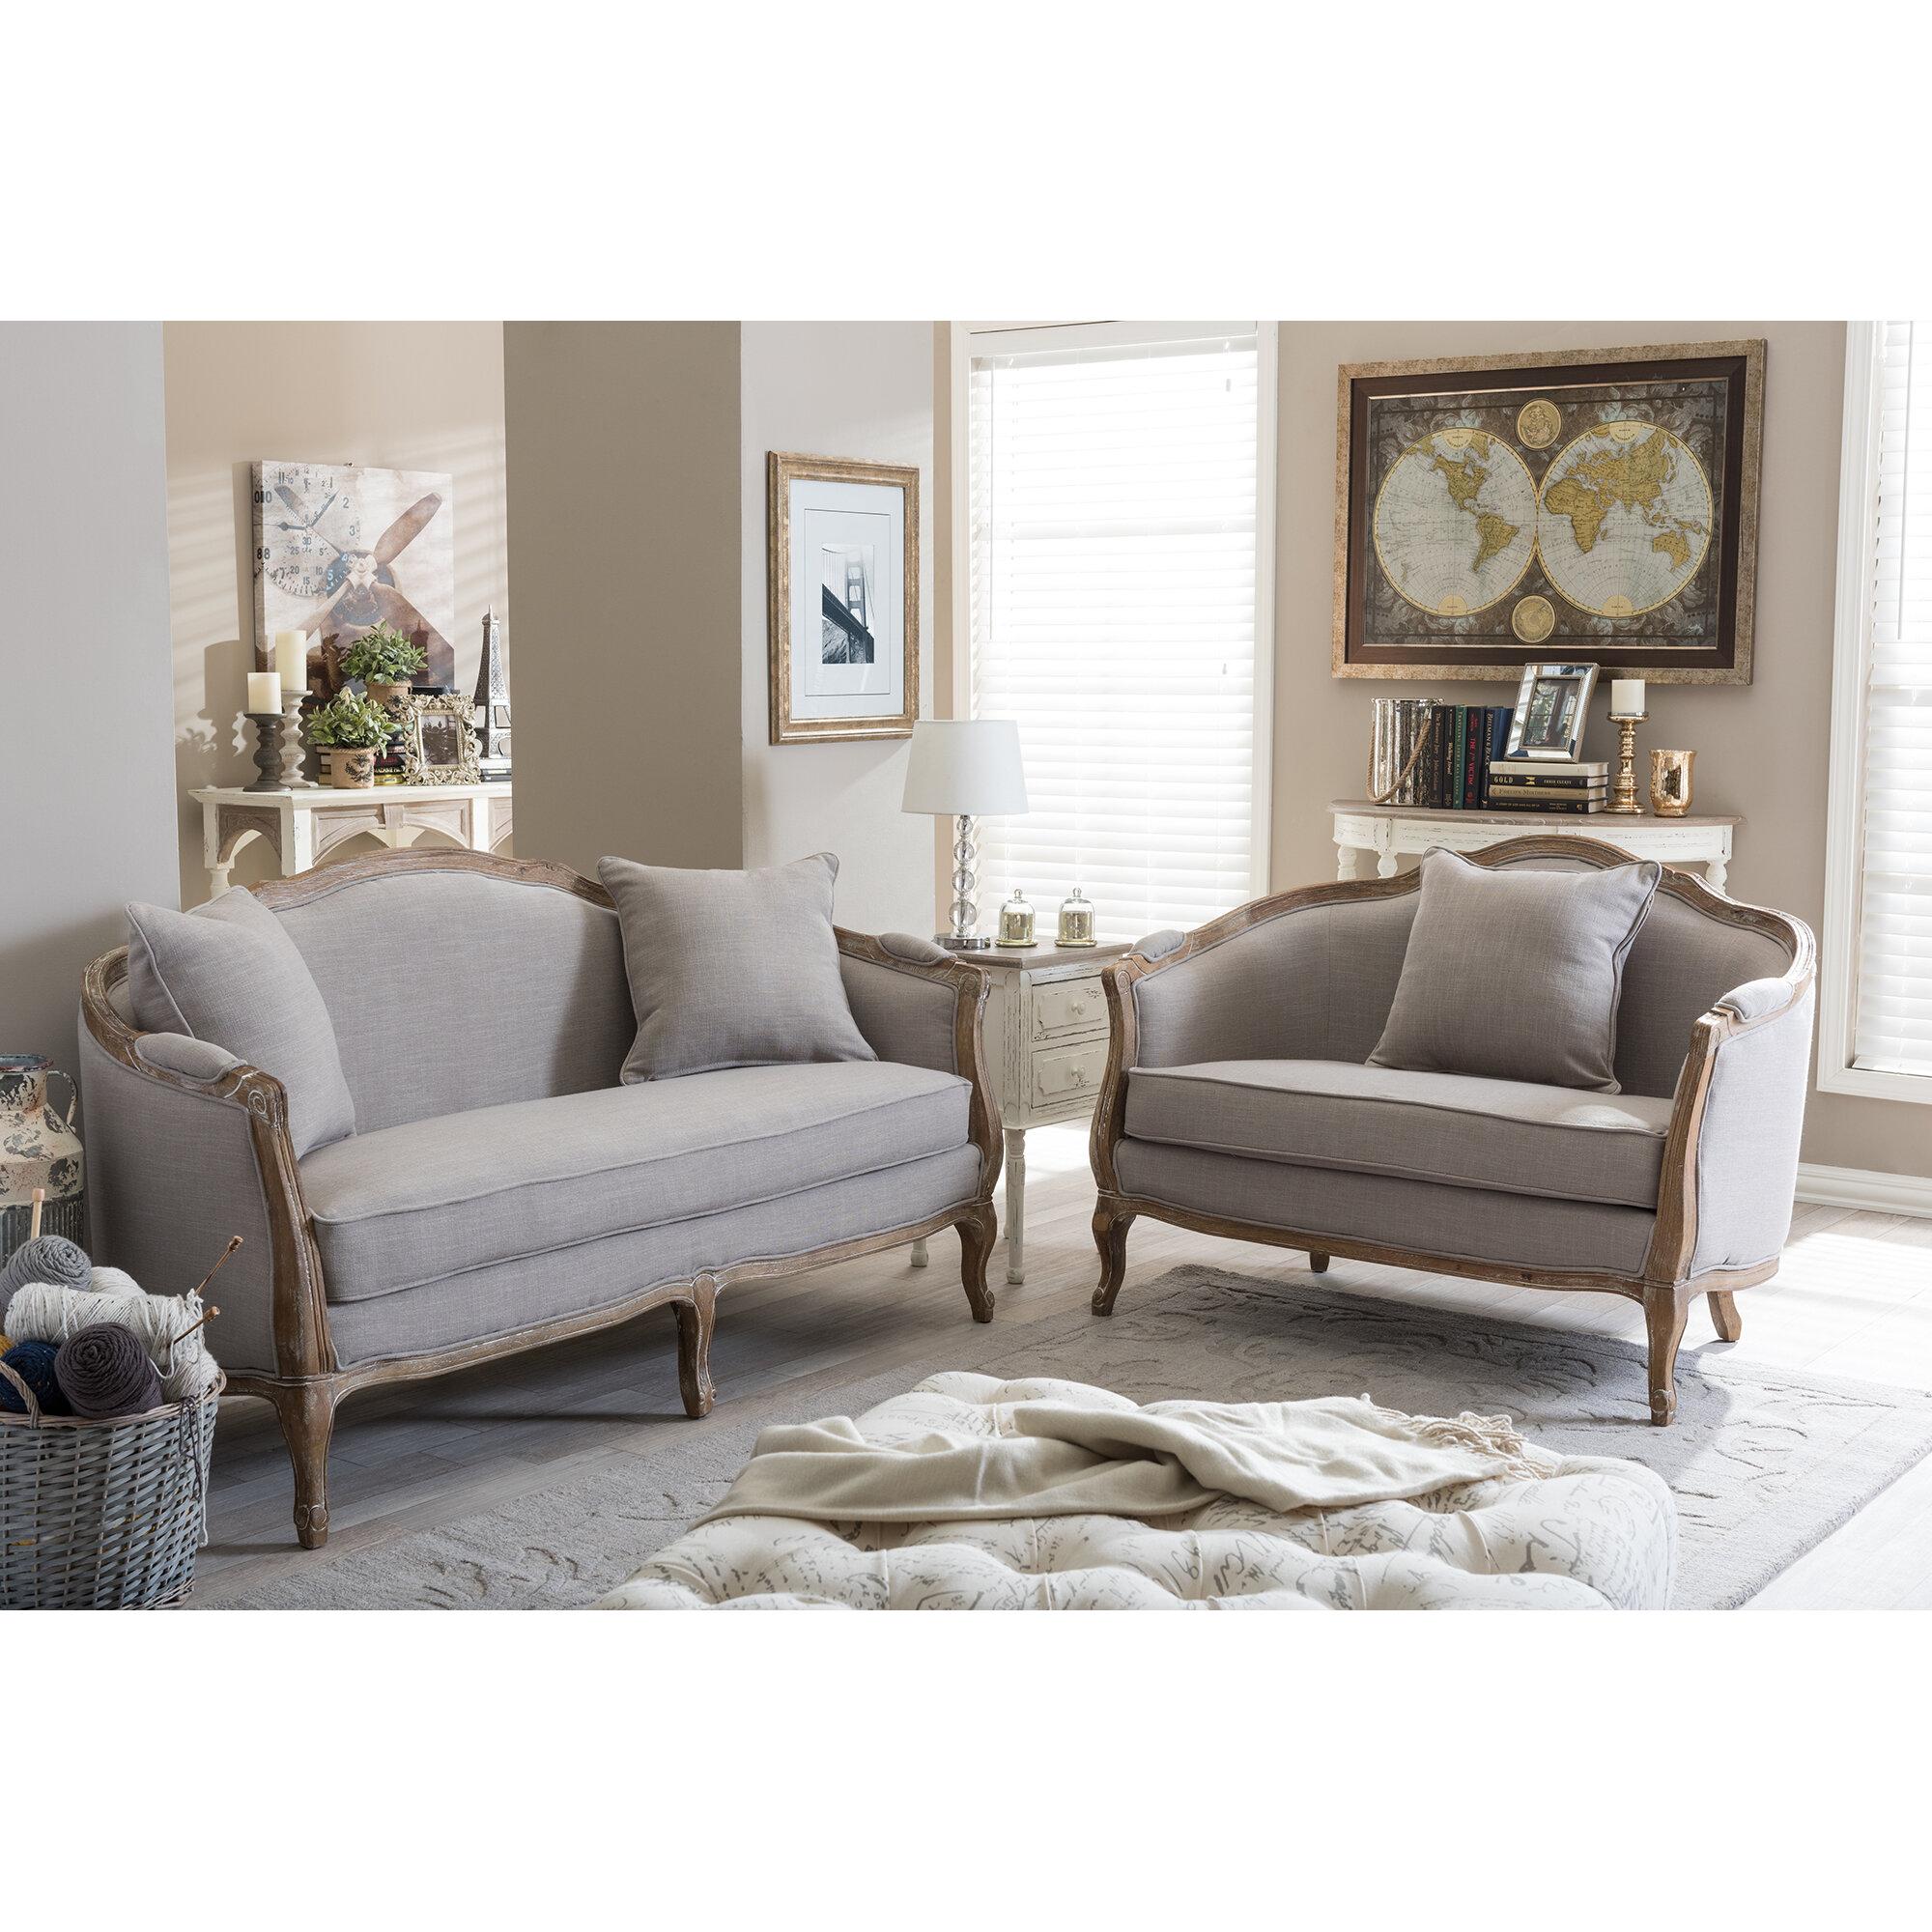 Celine 2 Piece Living Room Set